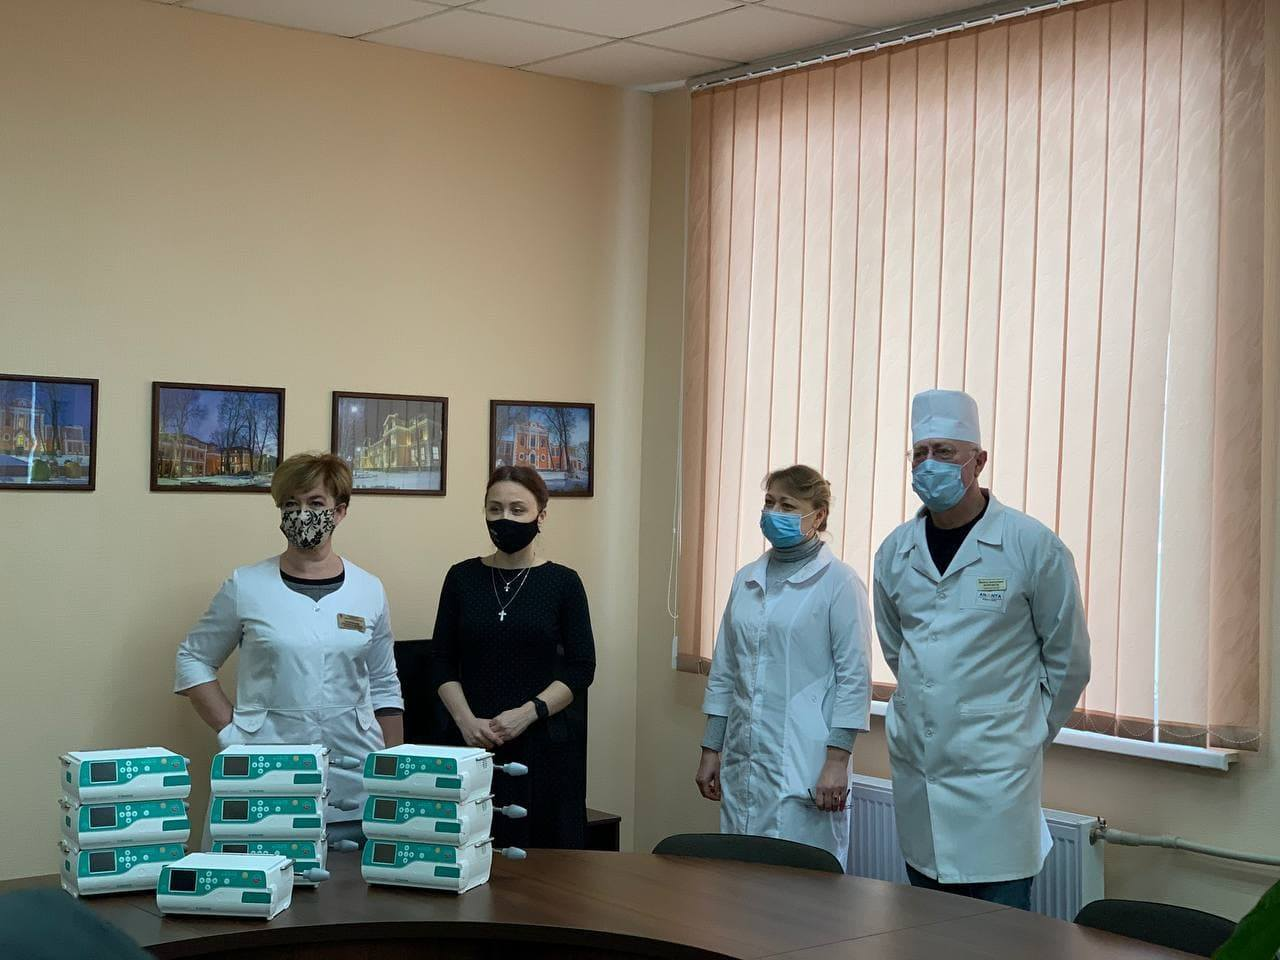 Маленьким пацiєнтам дитячої лiкарнi у Кропивницькому передали 10 iнфузiйних насосiв для хiмiотерапiї (ФОТО)